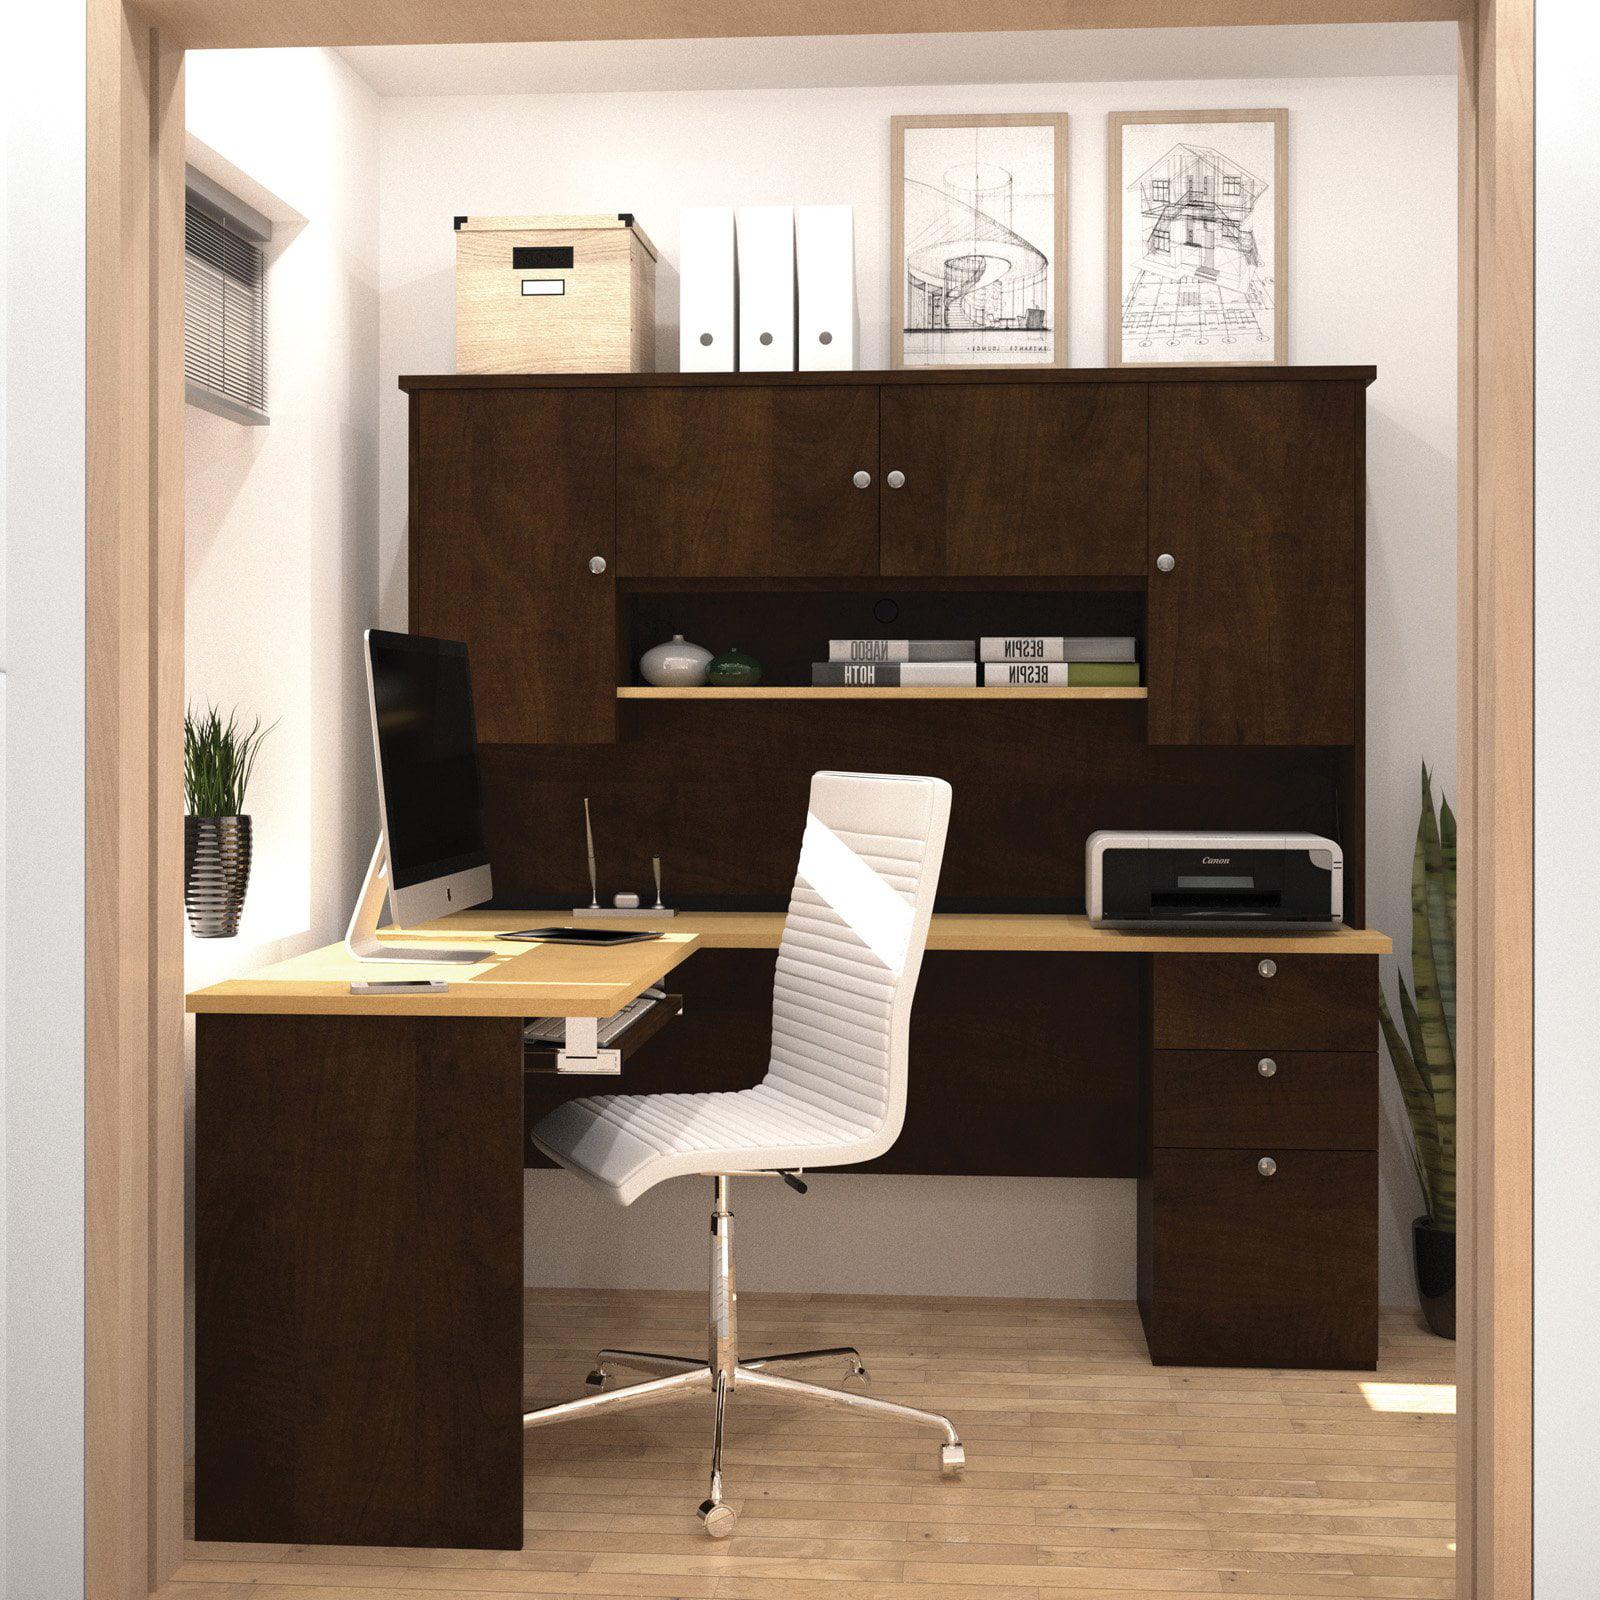 Bestar Manhattan L-Shaped Workstation in Secret Maple and Chocolate